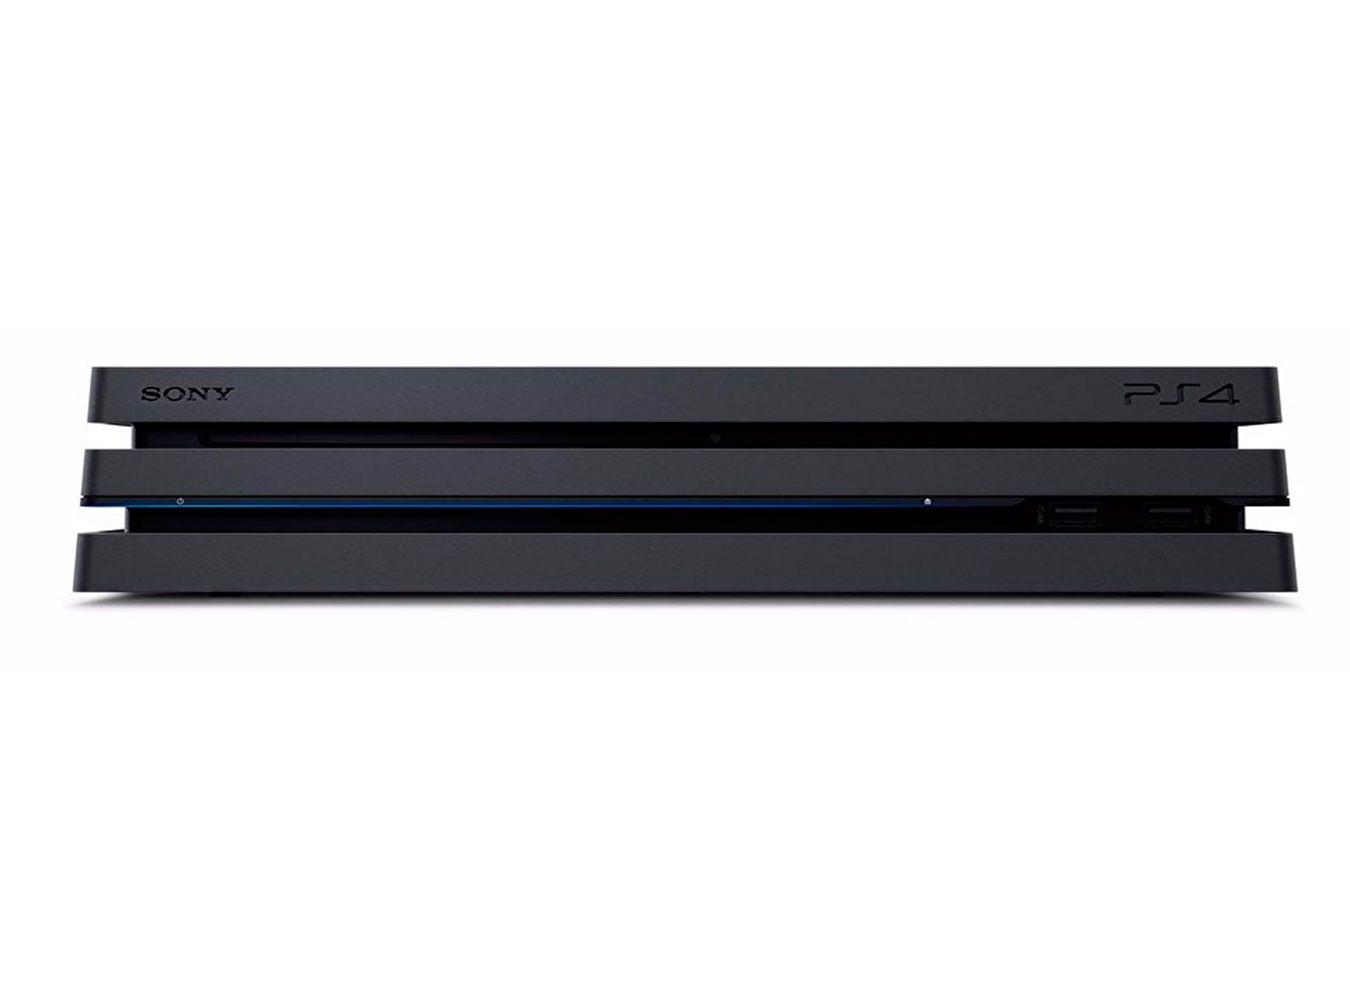 PlayStation 4 Pro 1Tb FIFA 17 2 джойстика изображение 2